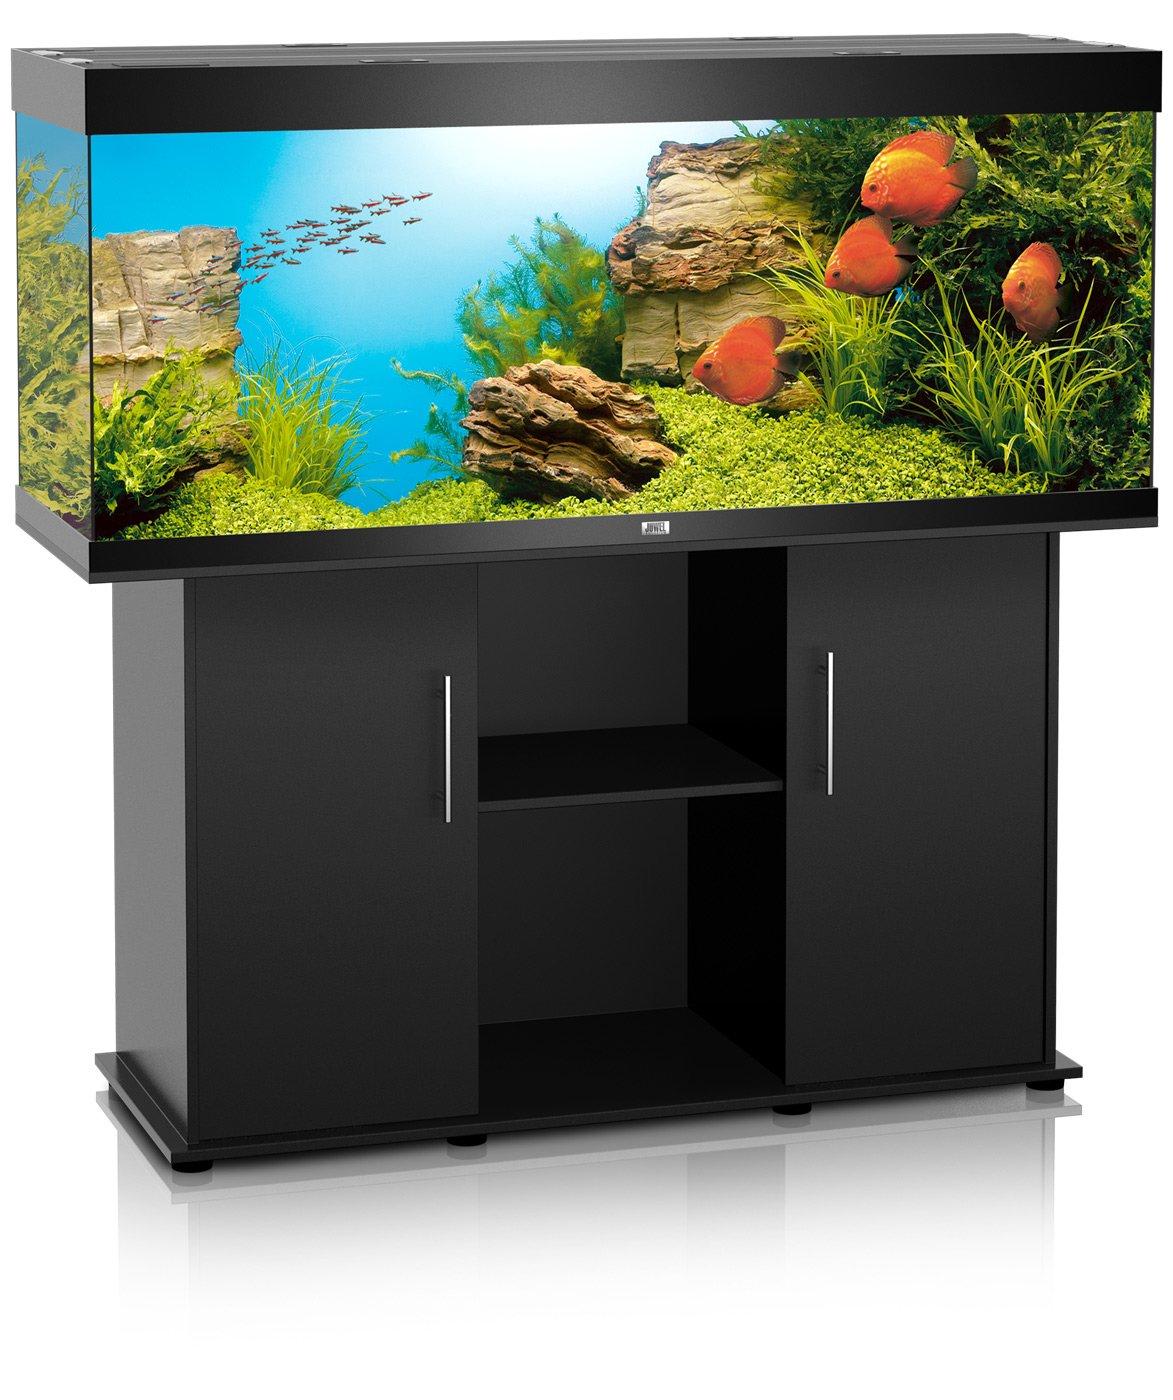 vente aquarium juwel rio 400 prix discount sur. Black Bedroom Furniture Sets. Home Design Ideas